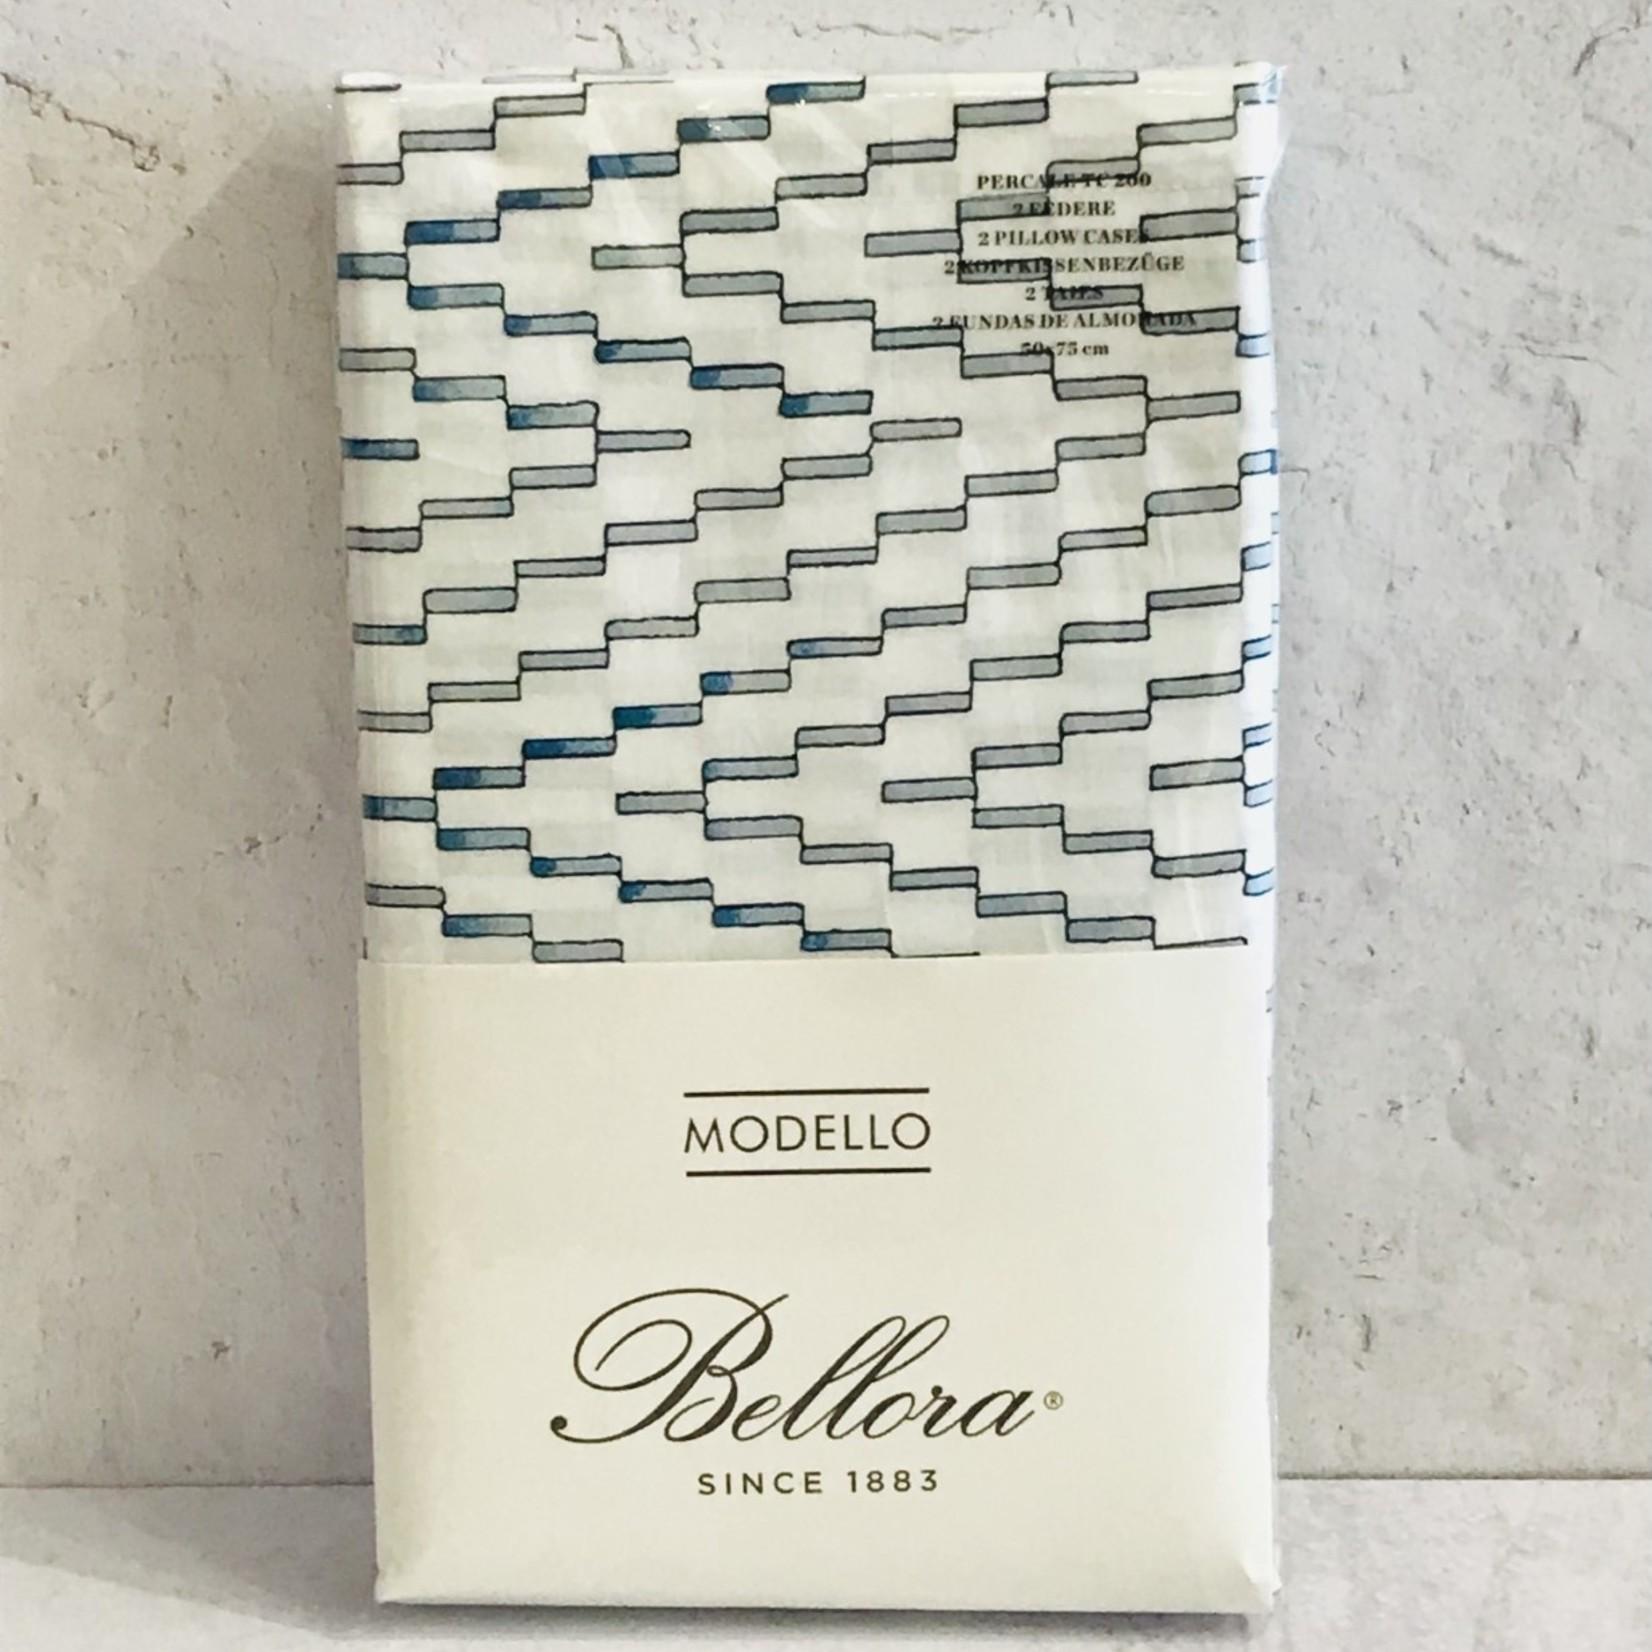 Bellora Bellora - Light Teal Rectangles Pillowcase (Pair)